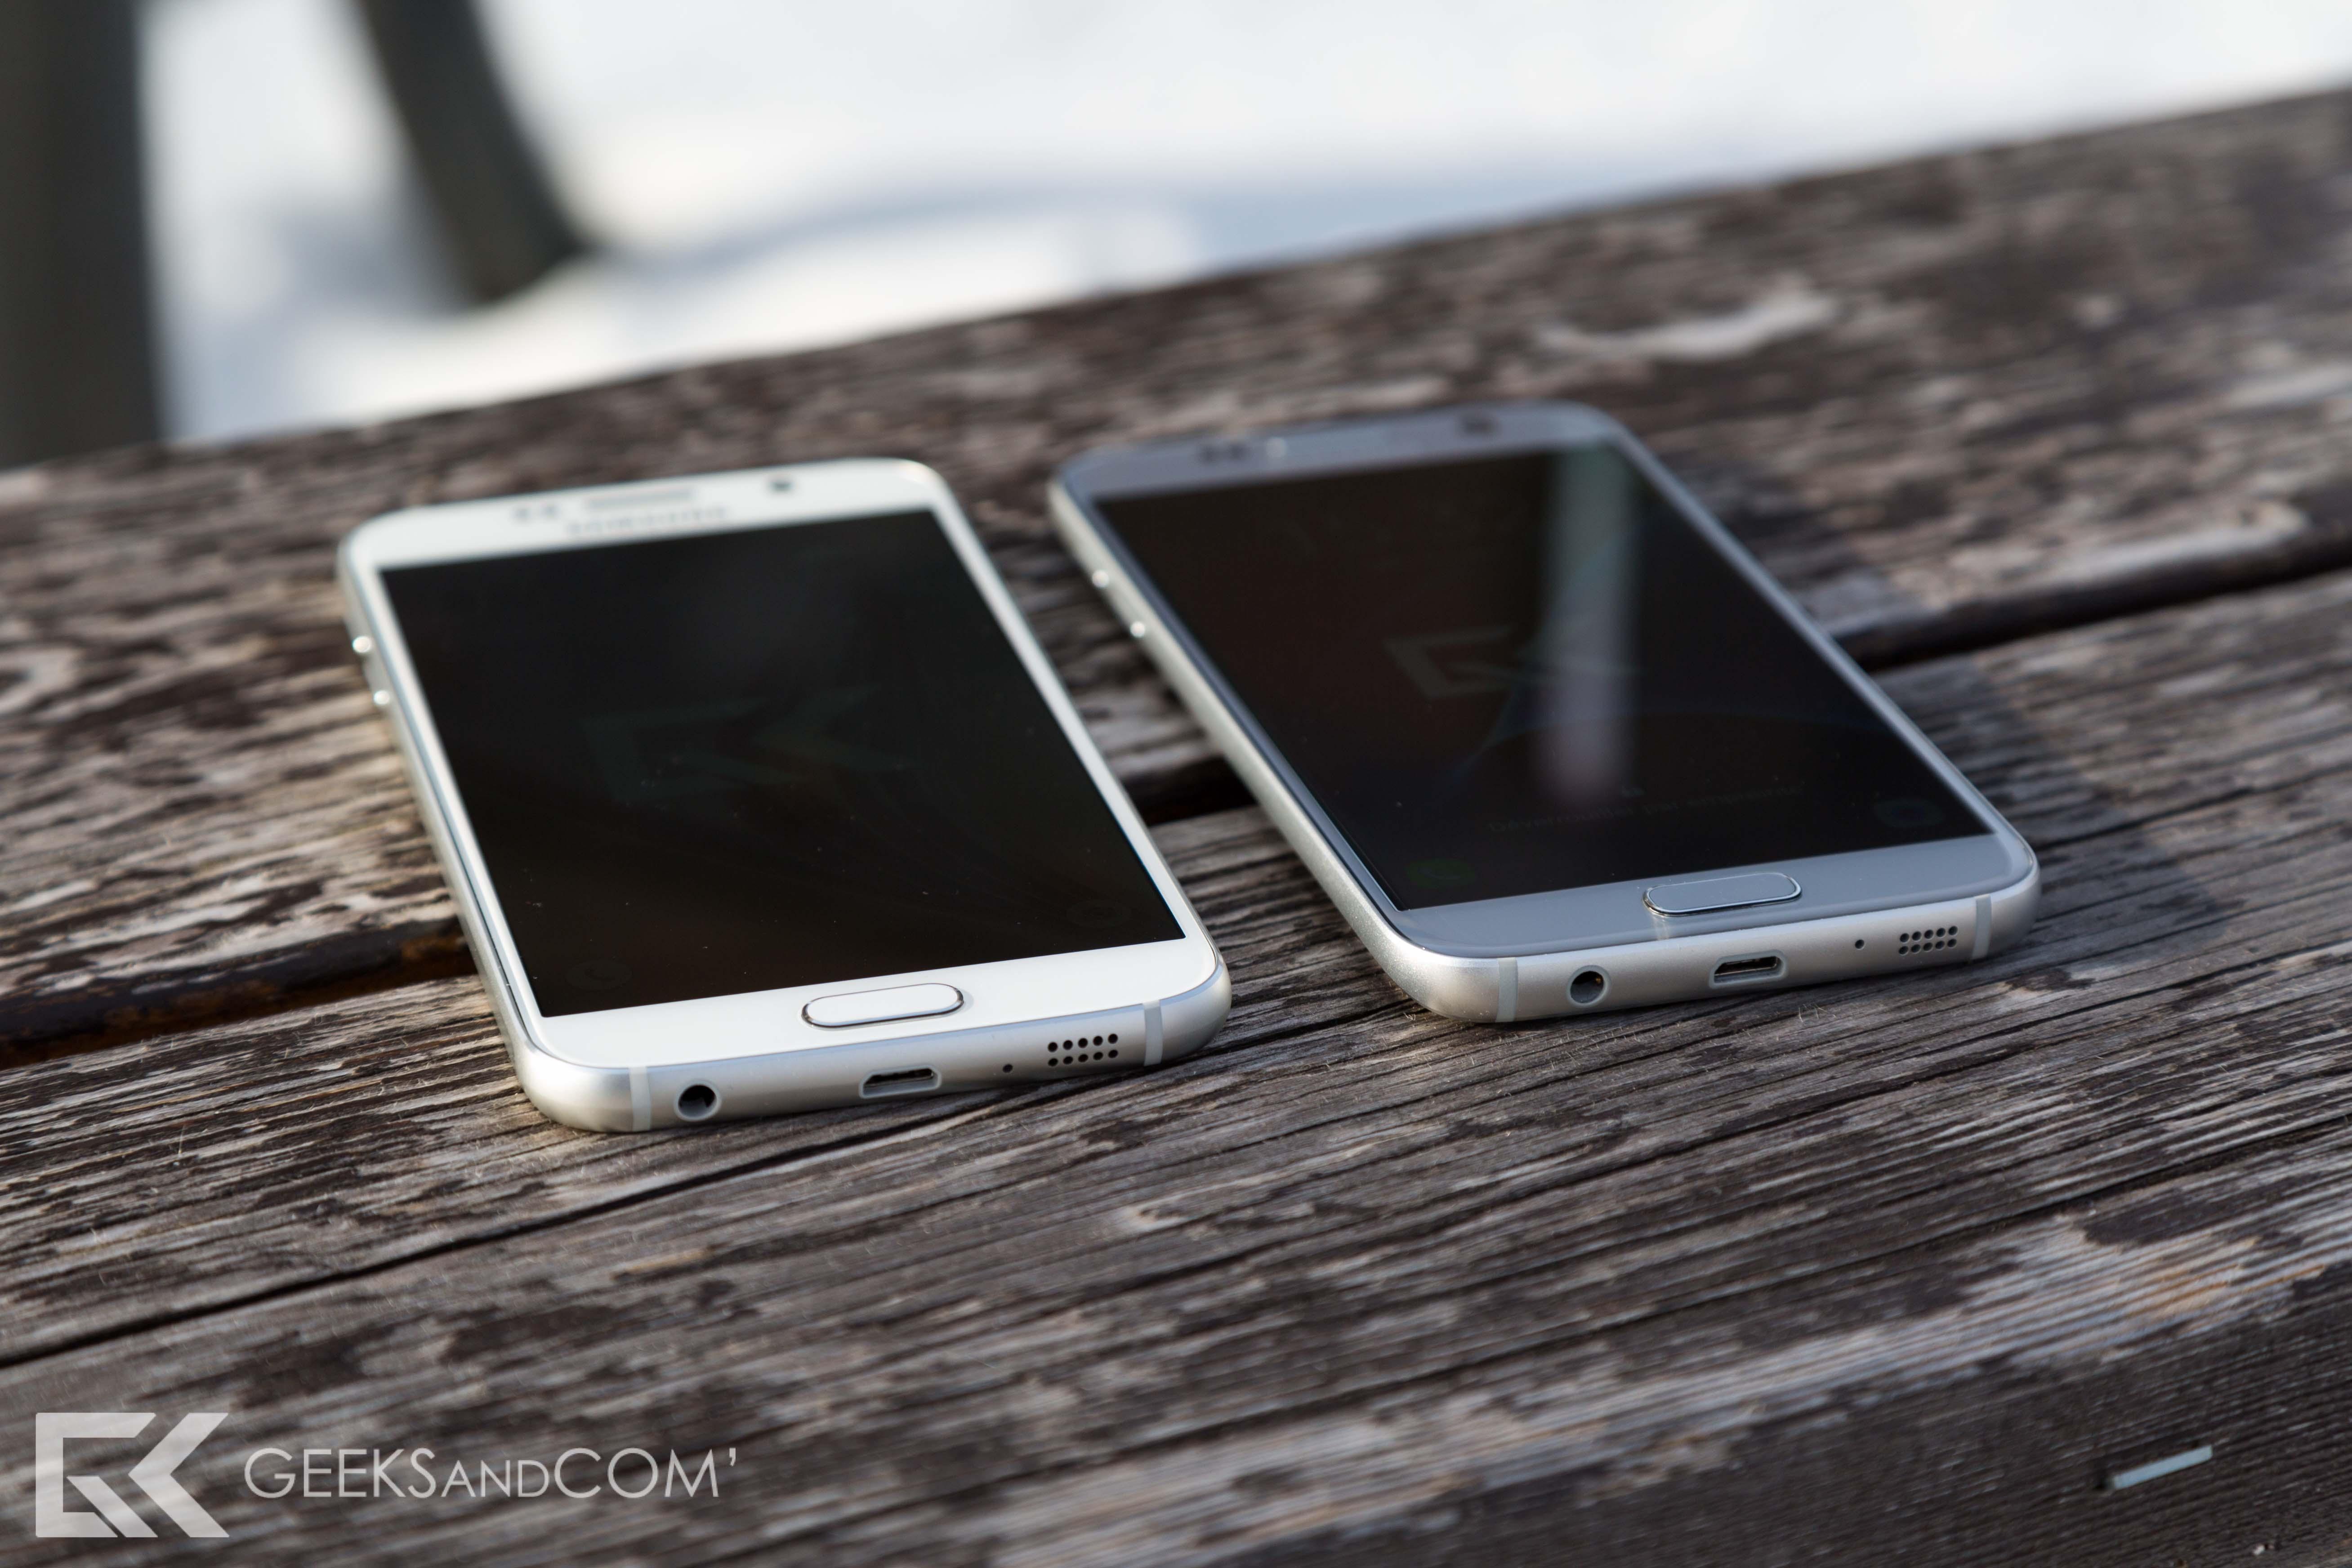 Samsung Galaxy S6 (à gauche) vs Galaxy S7 (à droite)